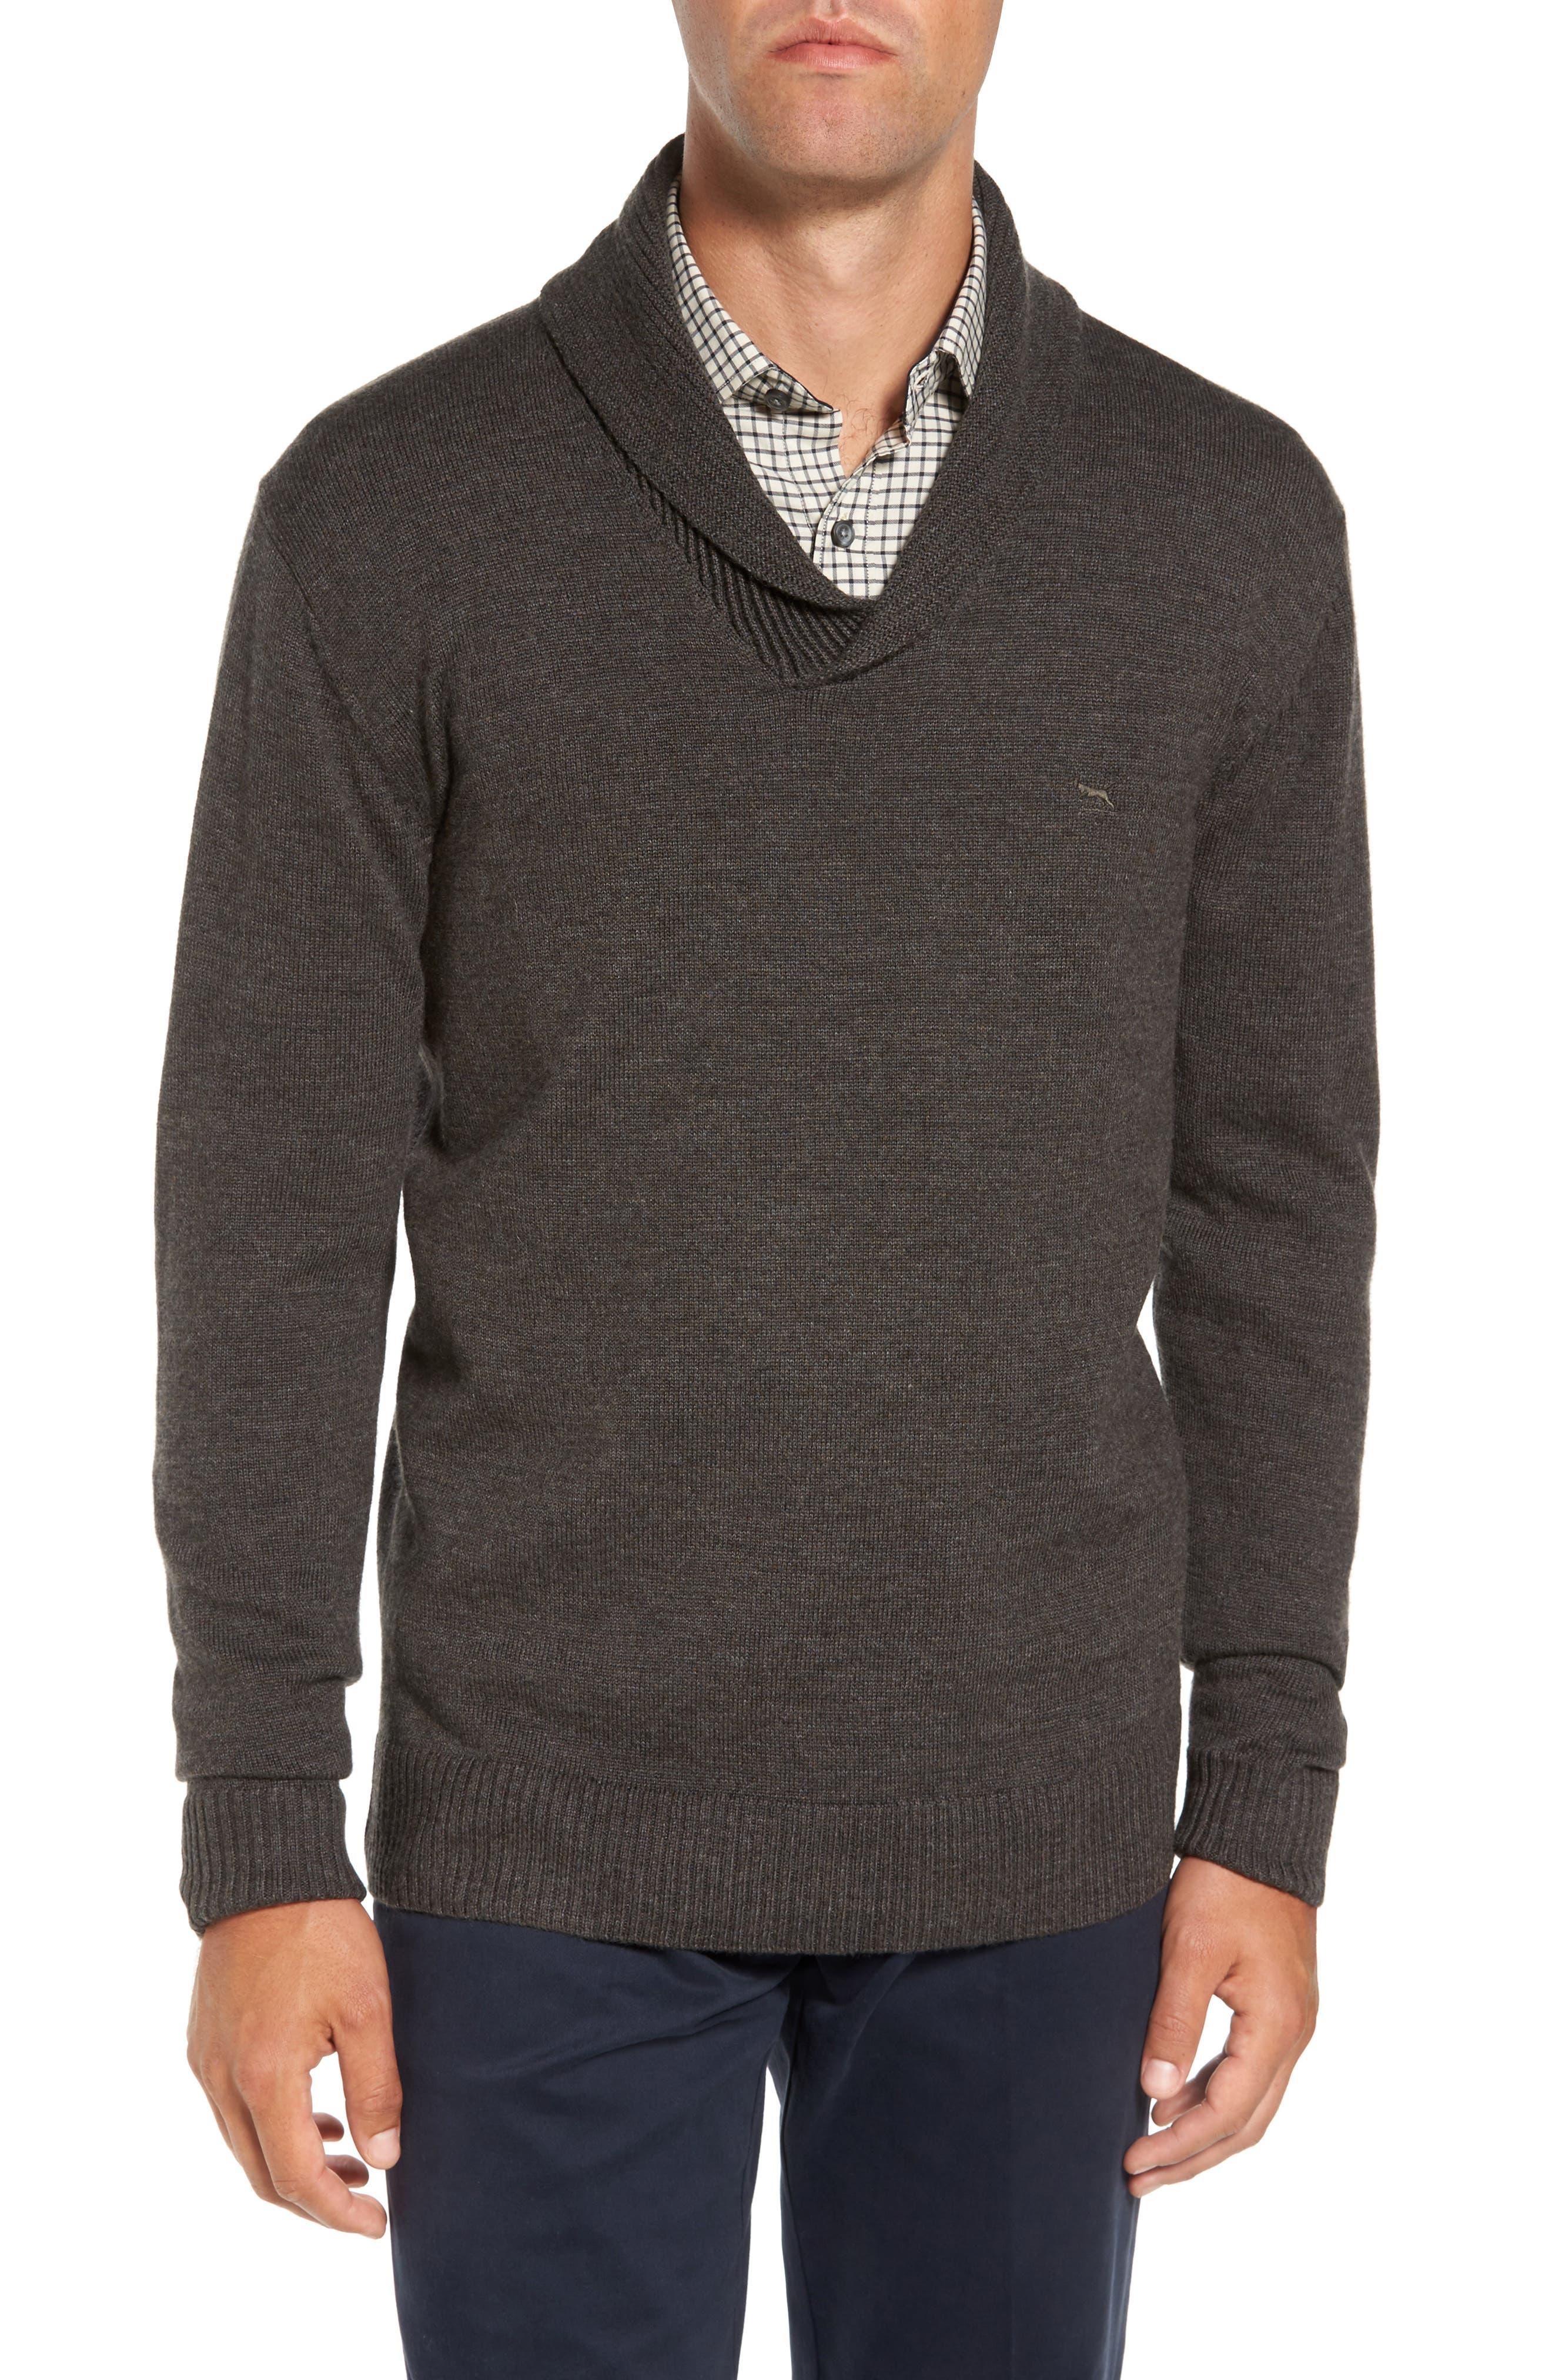 Main Image - Rodd & Gunn PT Chevalier Shawl Collar Sweater